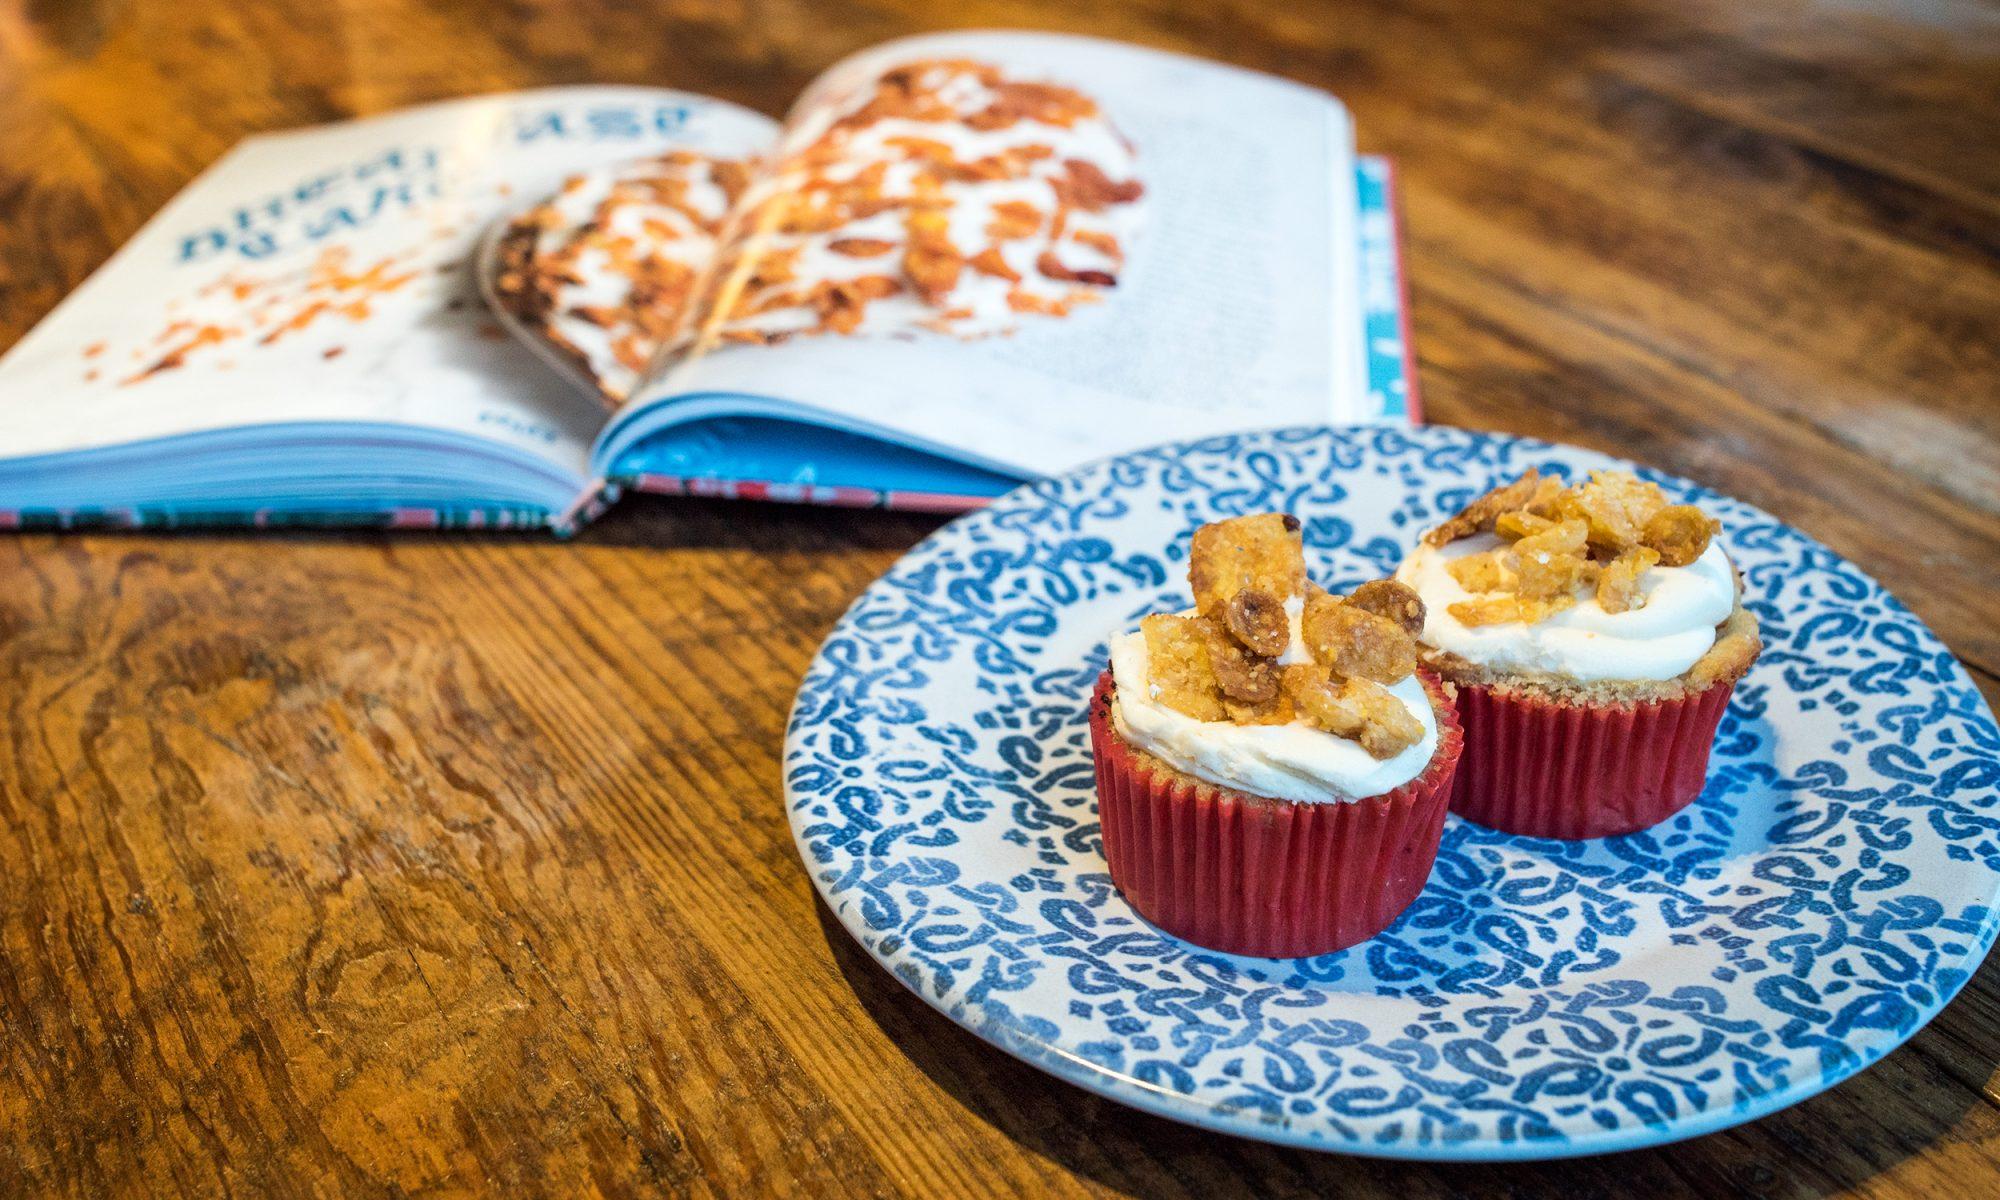 Clara Cakes' Breakfast Cake